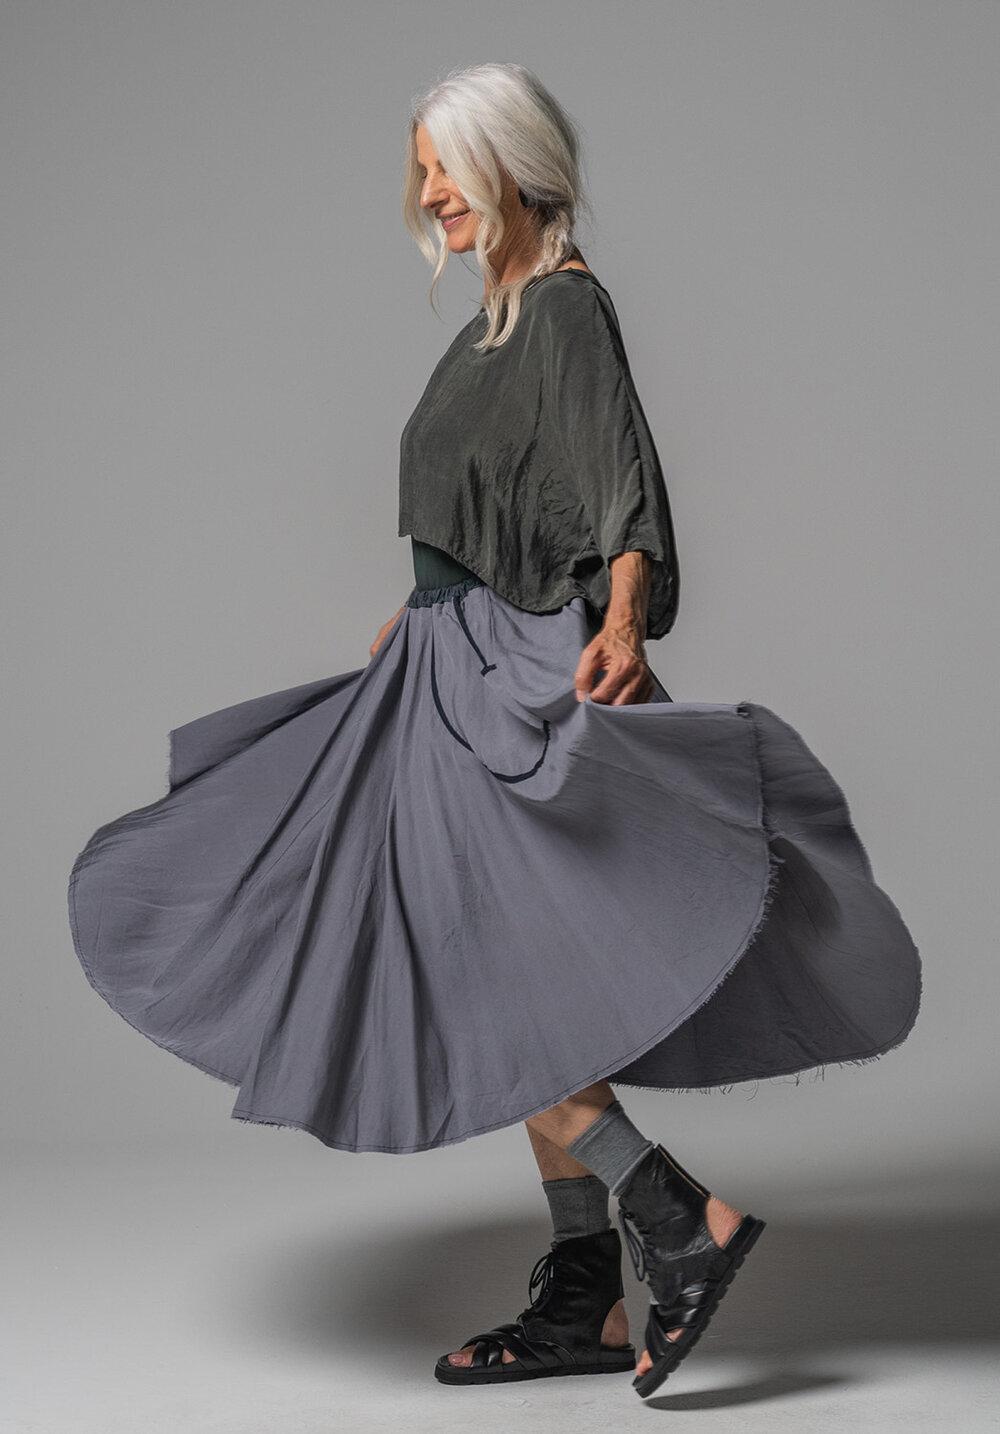 Archive top, Greta singlet + Fade midi skirt